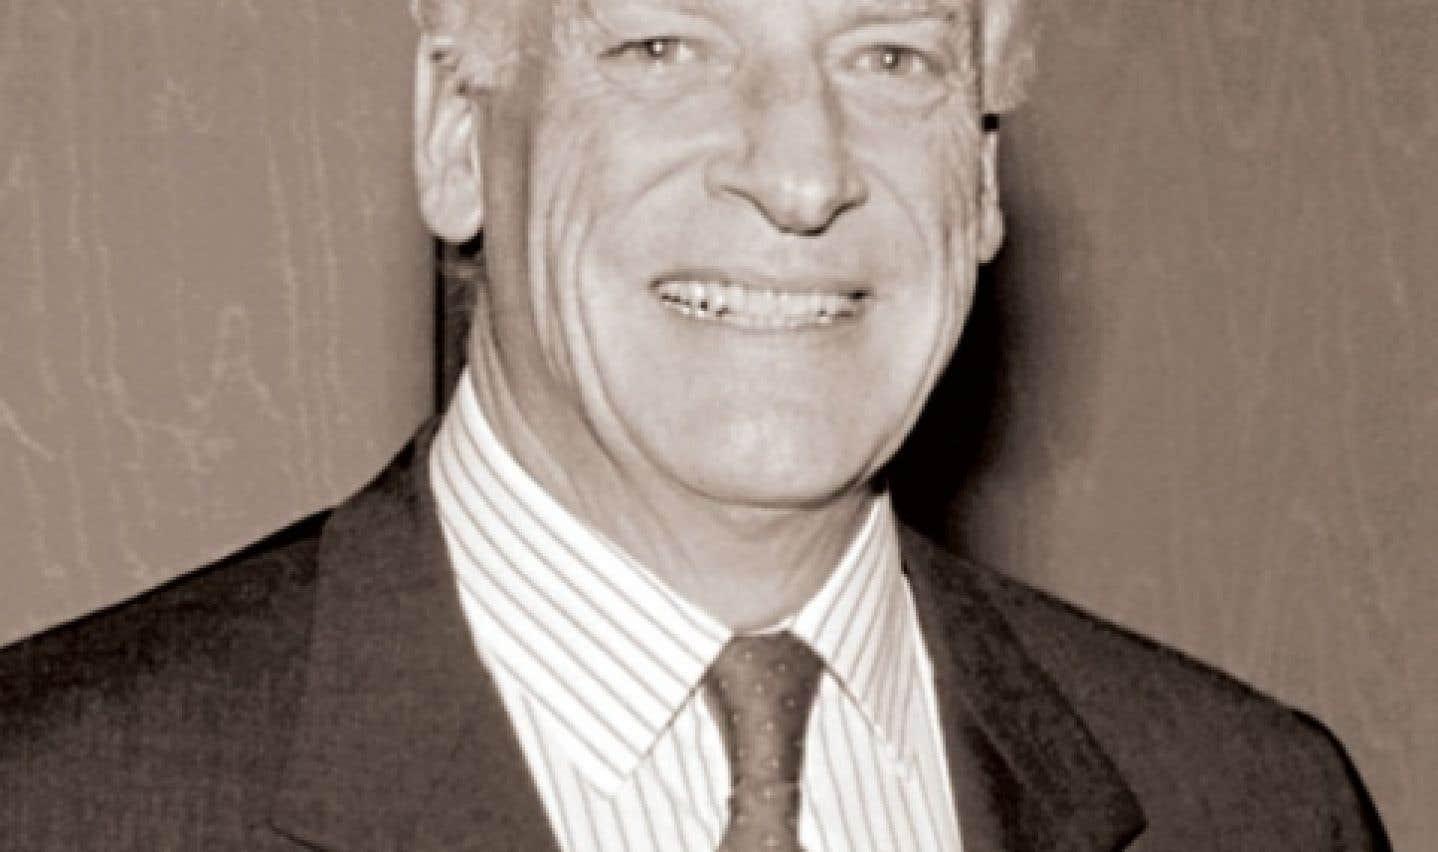 Derek A. Price, bénévole d'affaires